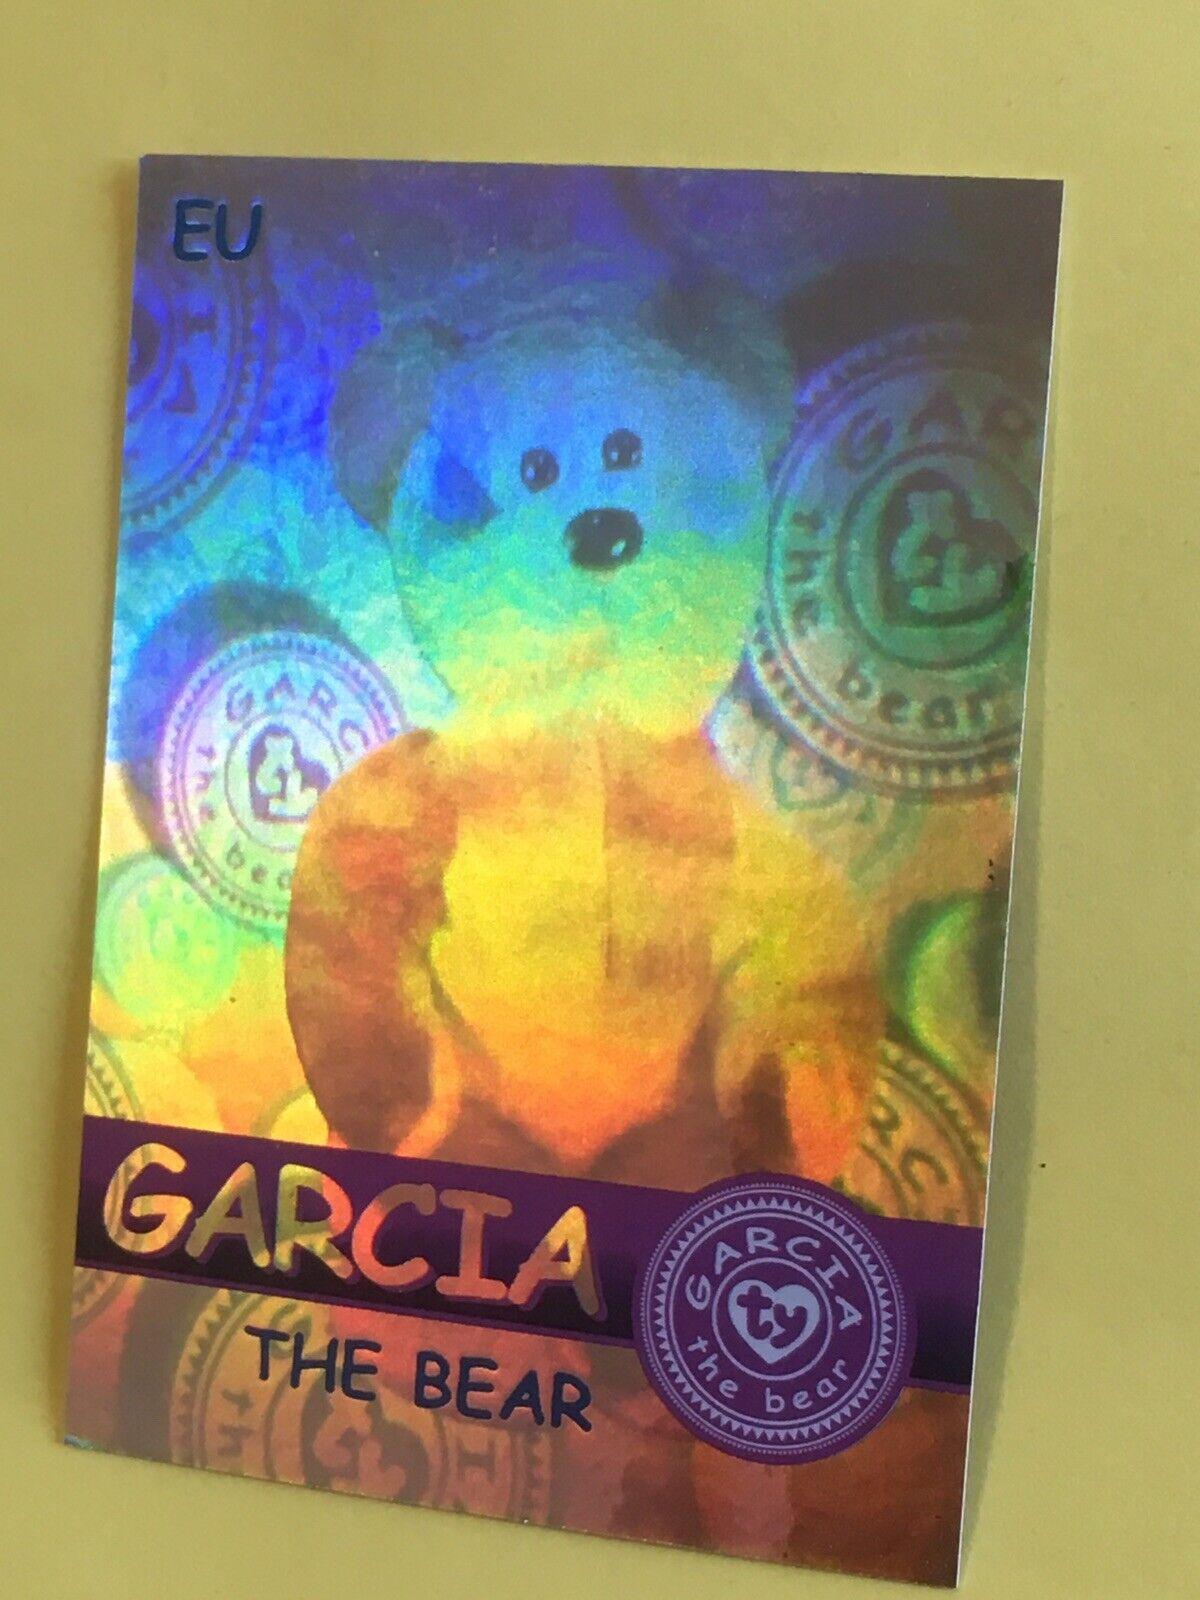 Ty Beanie Babies Trading Card EU Garcia The Bear Hologram, Series 2